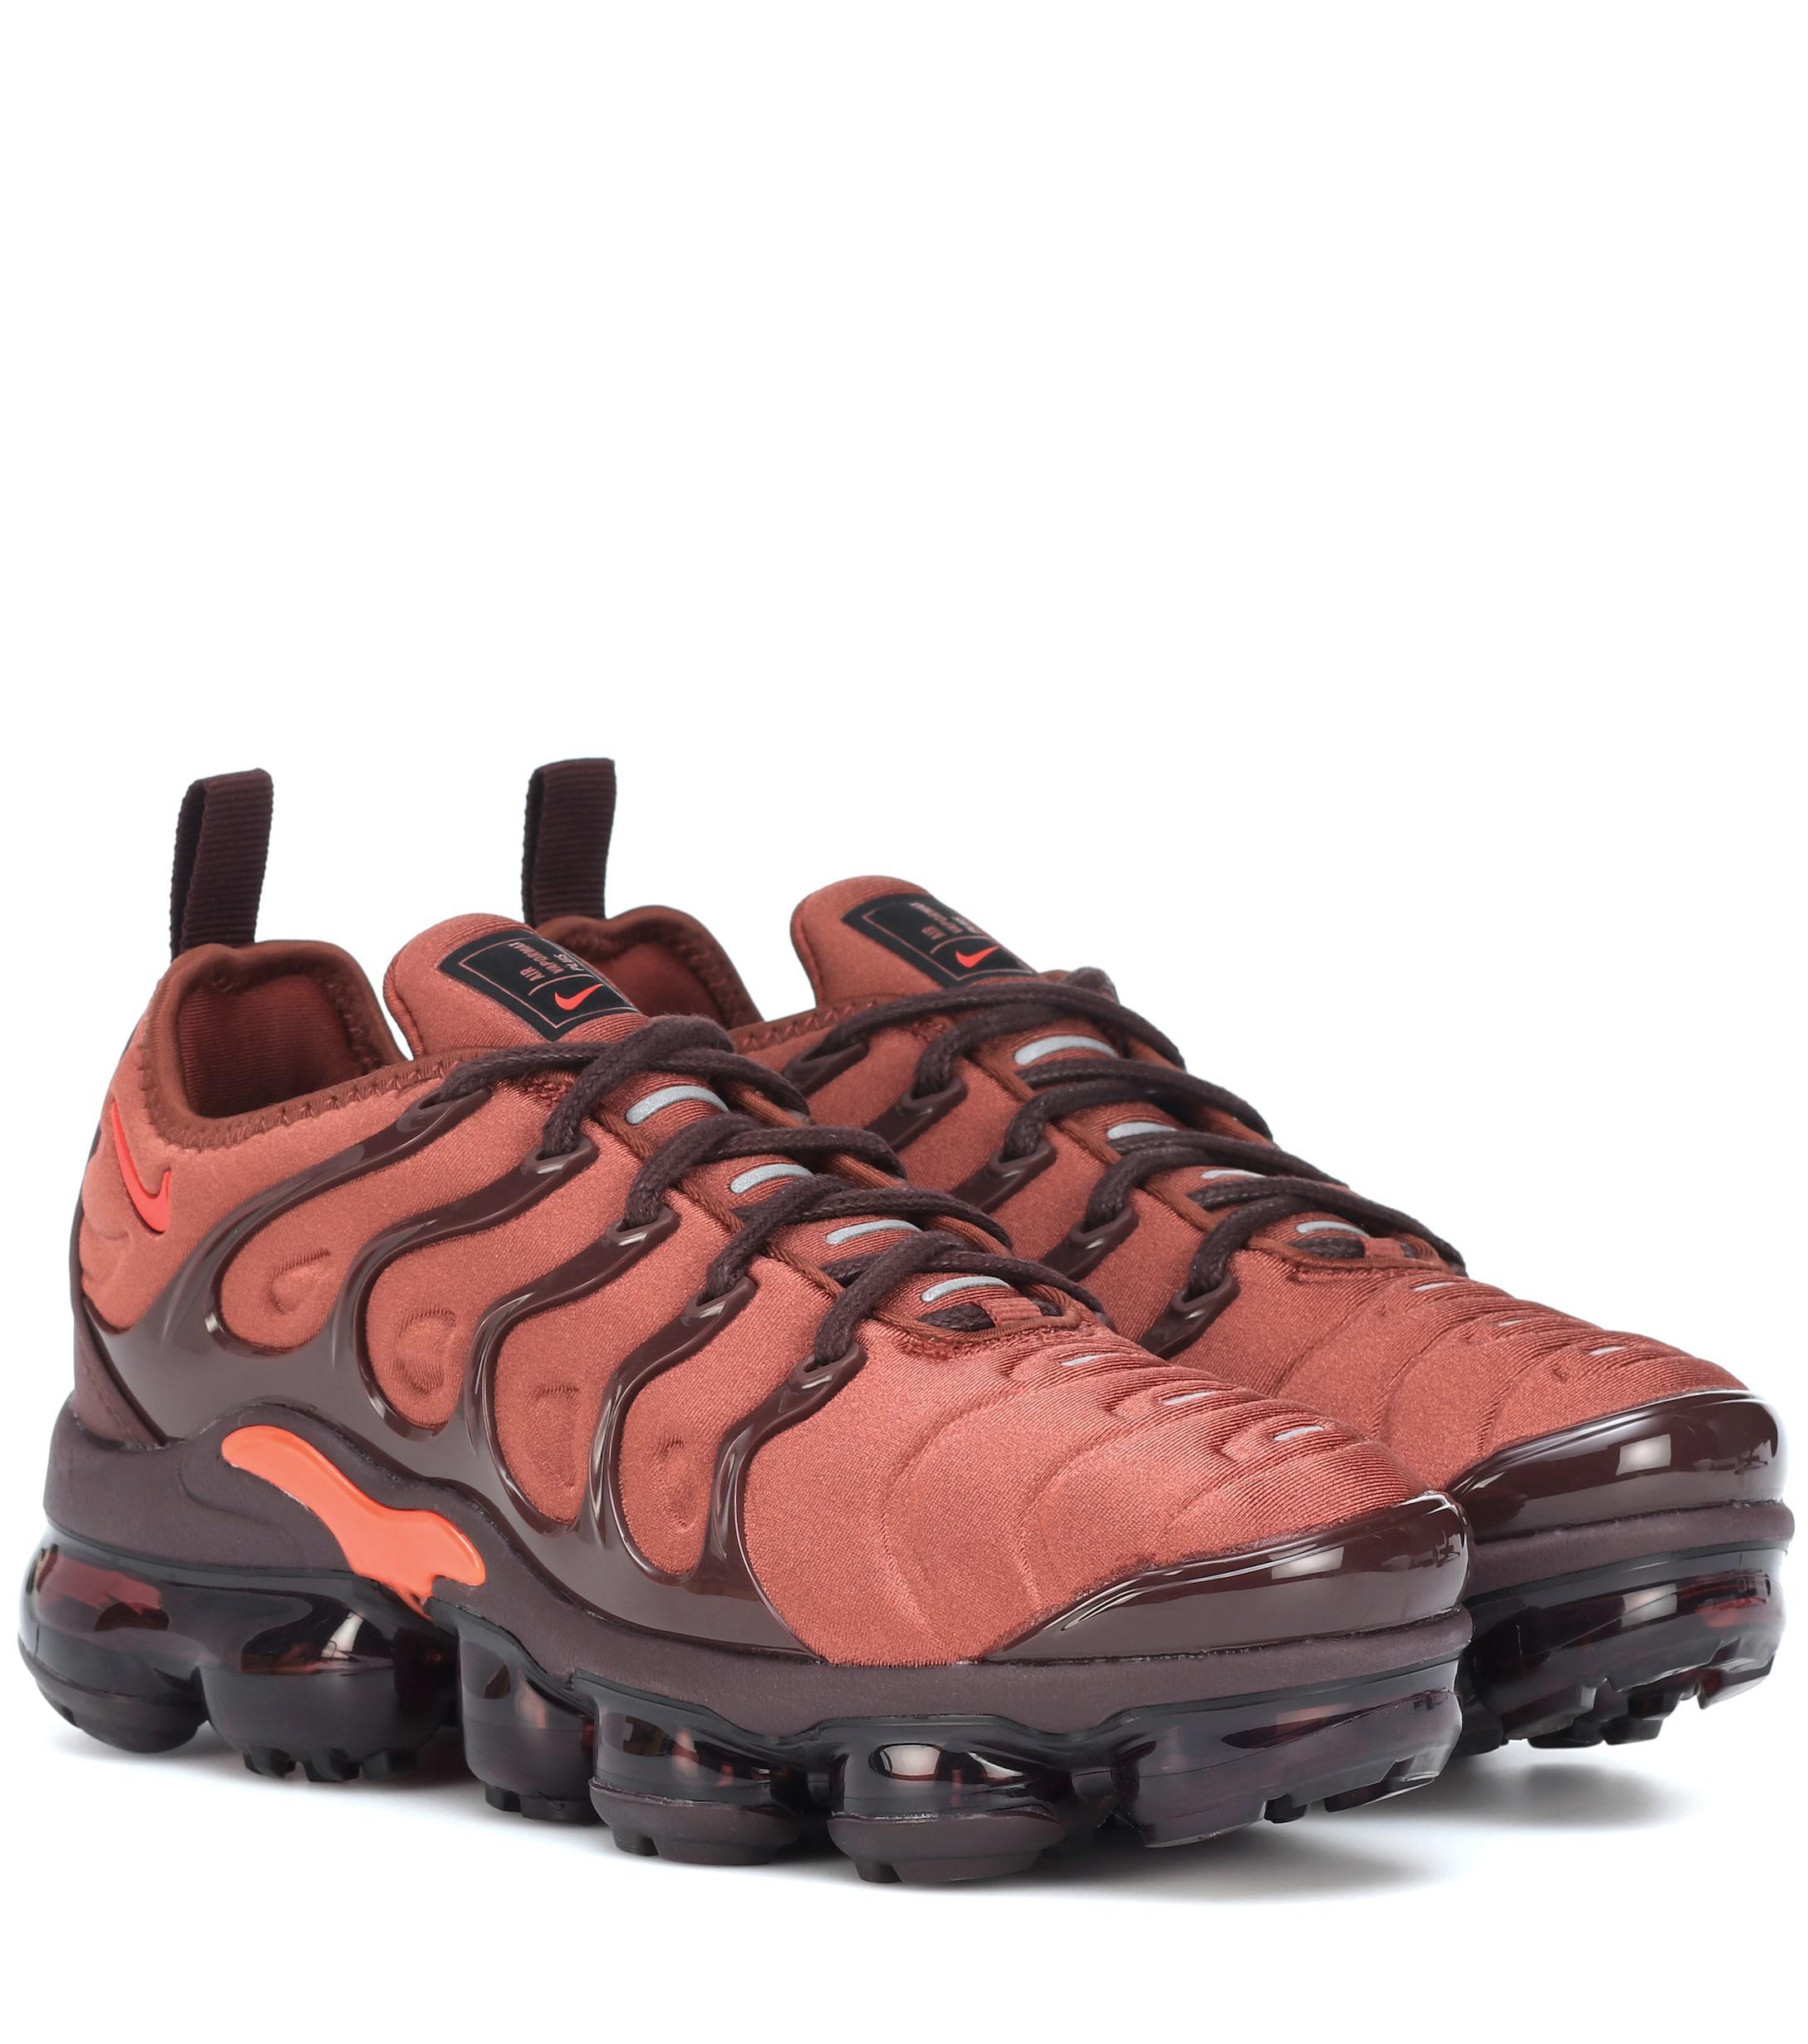 big sale 01638 845b3 Women's Orange Air Vapormax Plus Sneakers